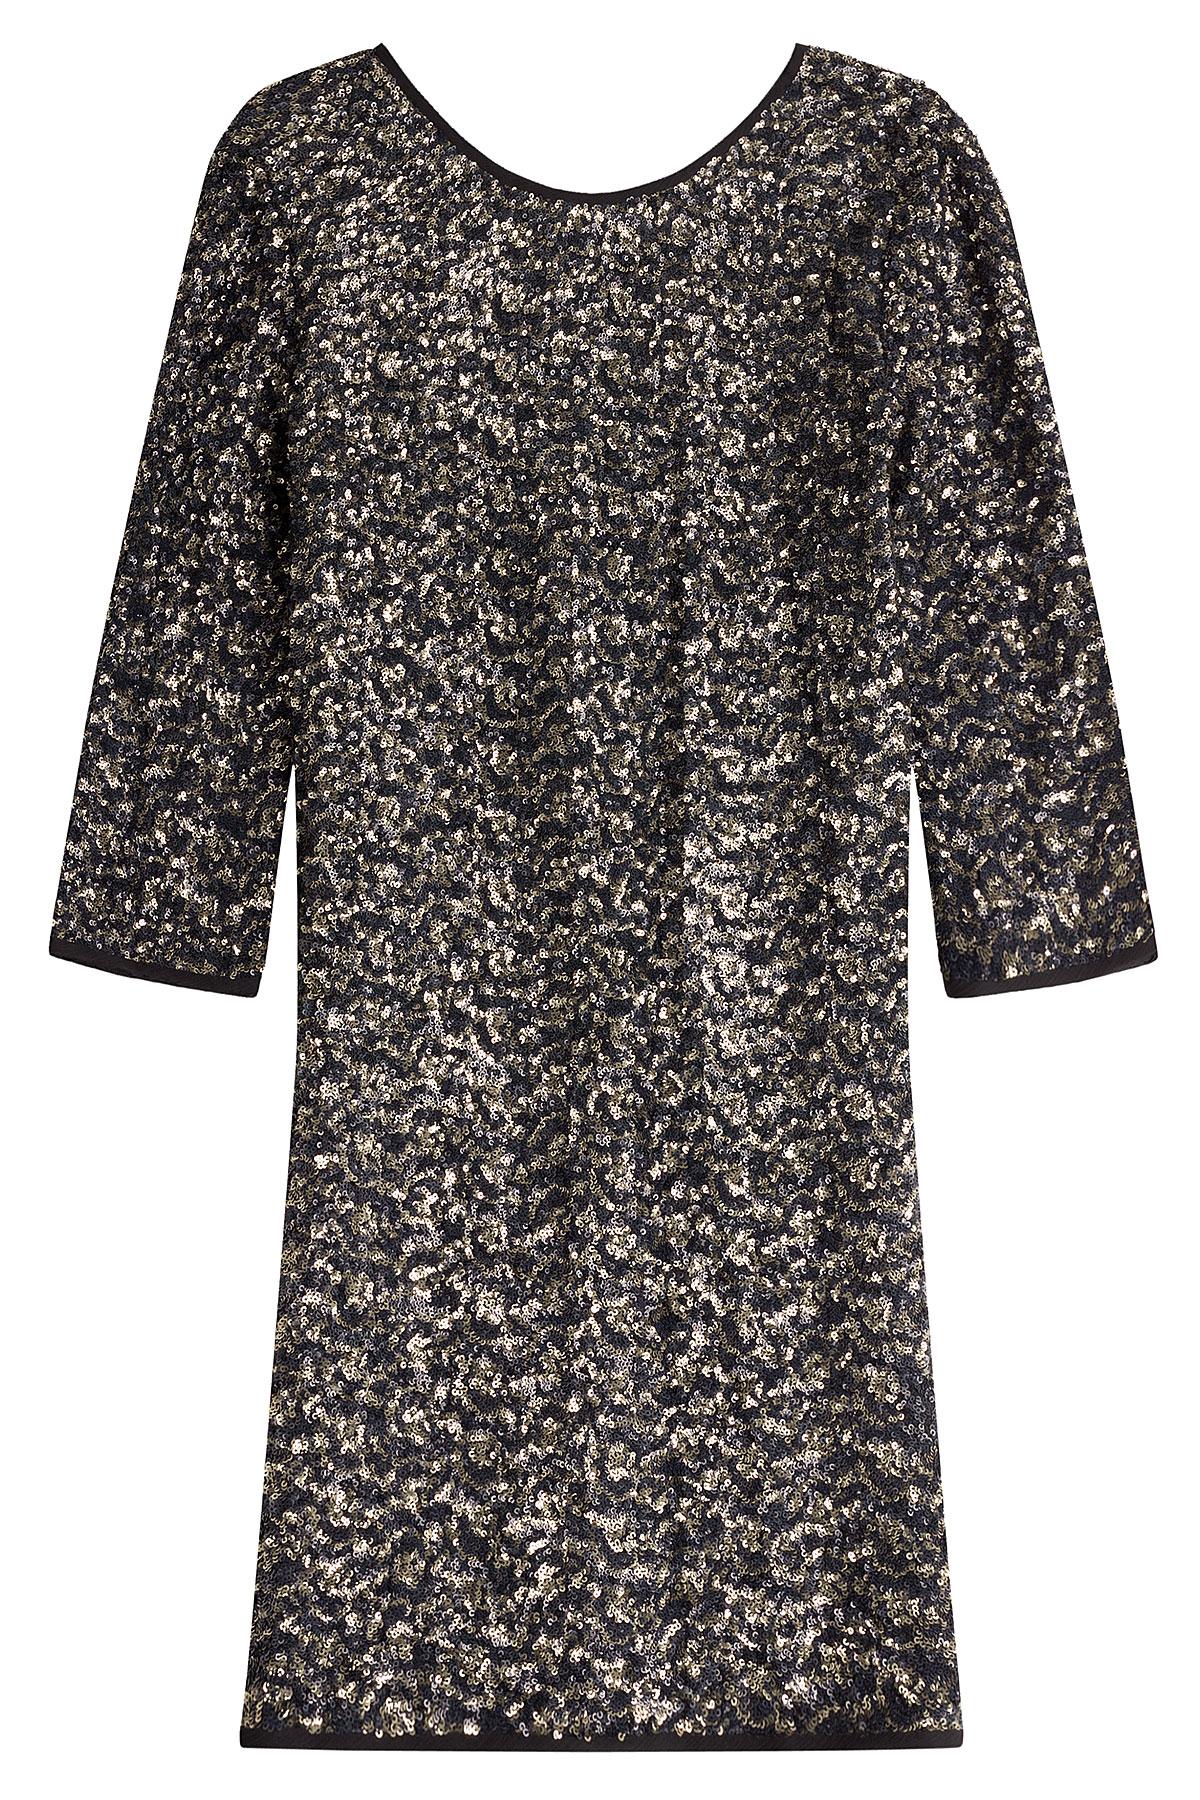 Zadig &amp- voltaire Sequin Dress - Multicolor in Black - Lyst